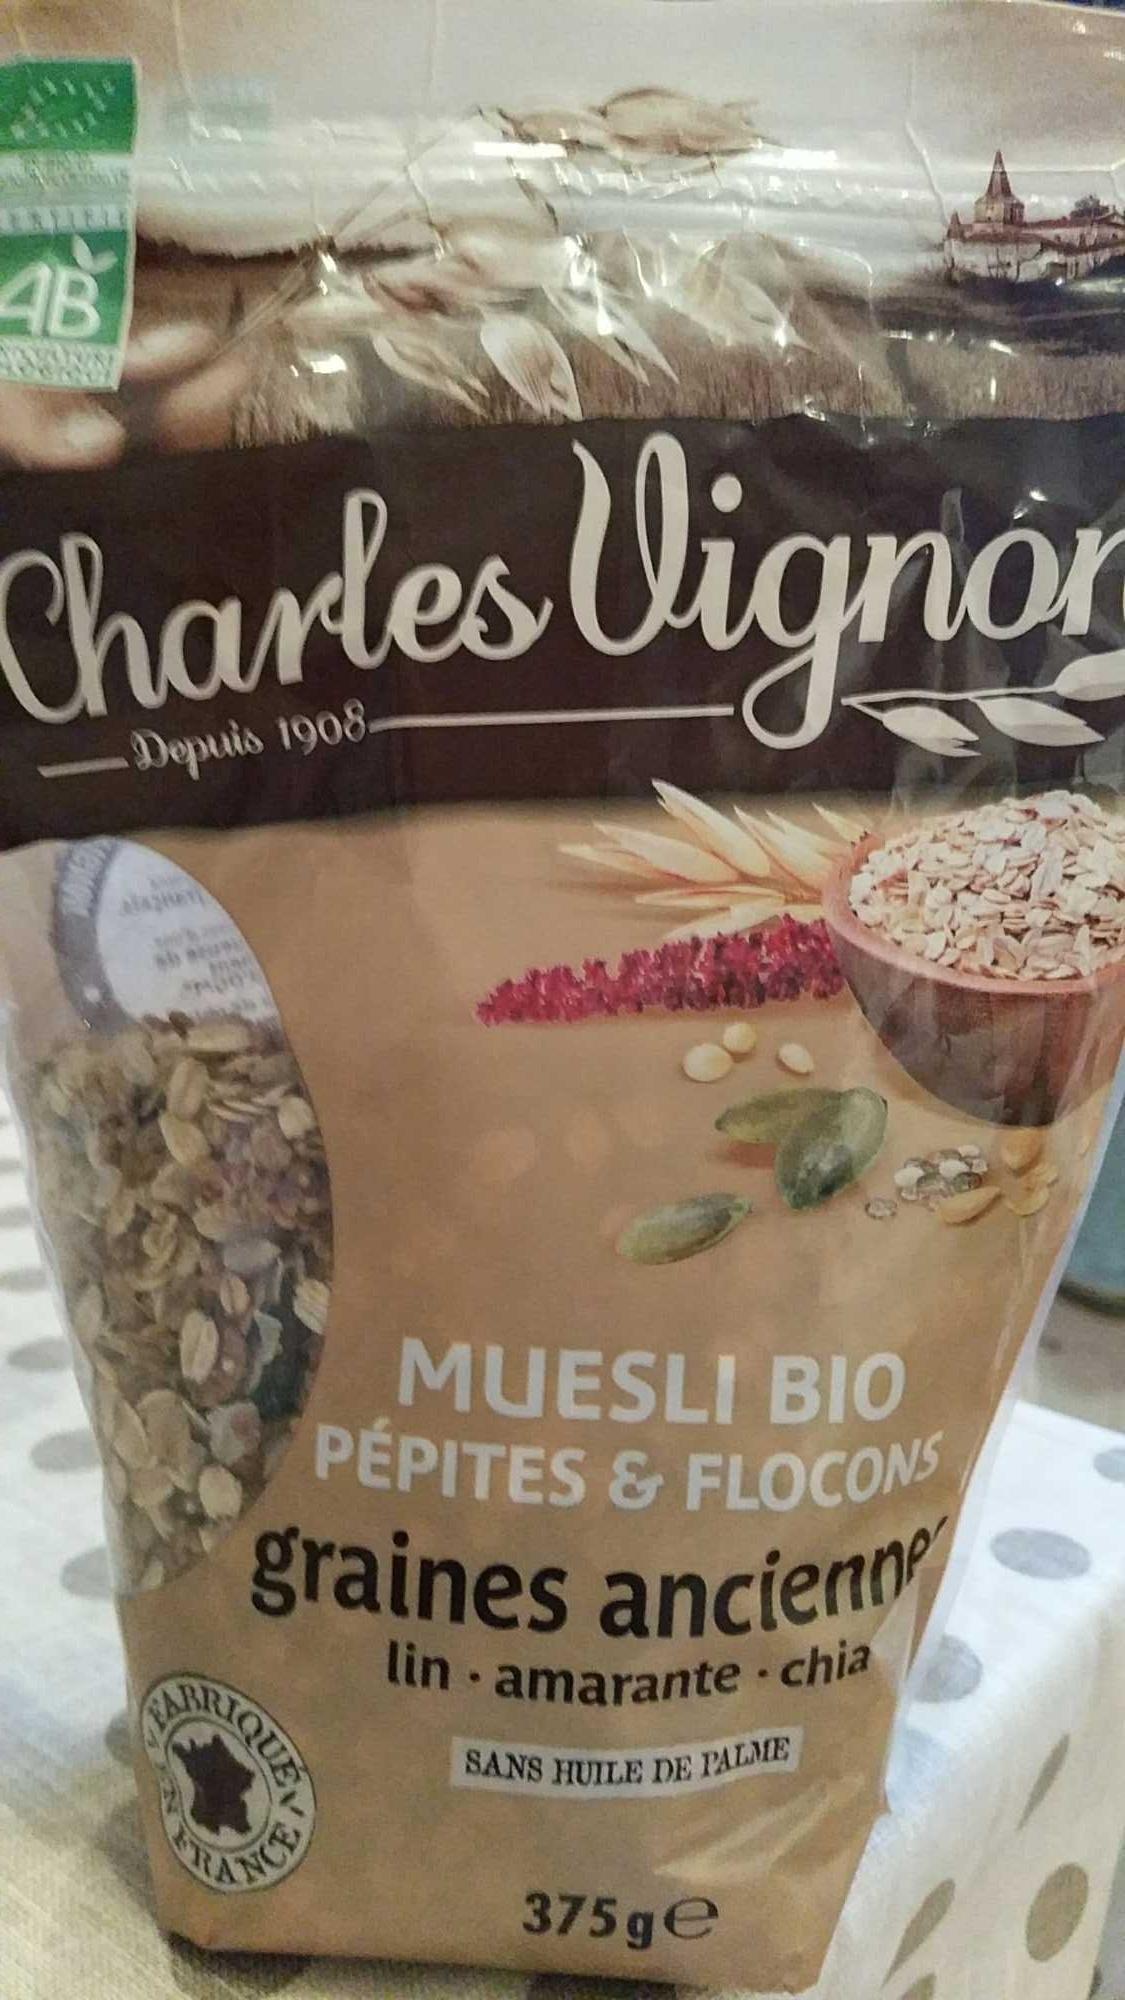 Muesli bio pepites & flocons graines anciennes - Product - fr